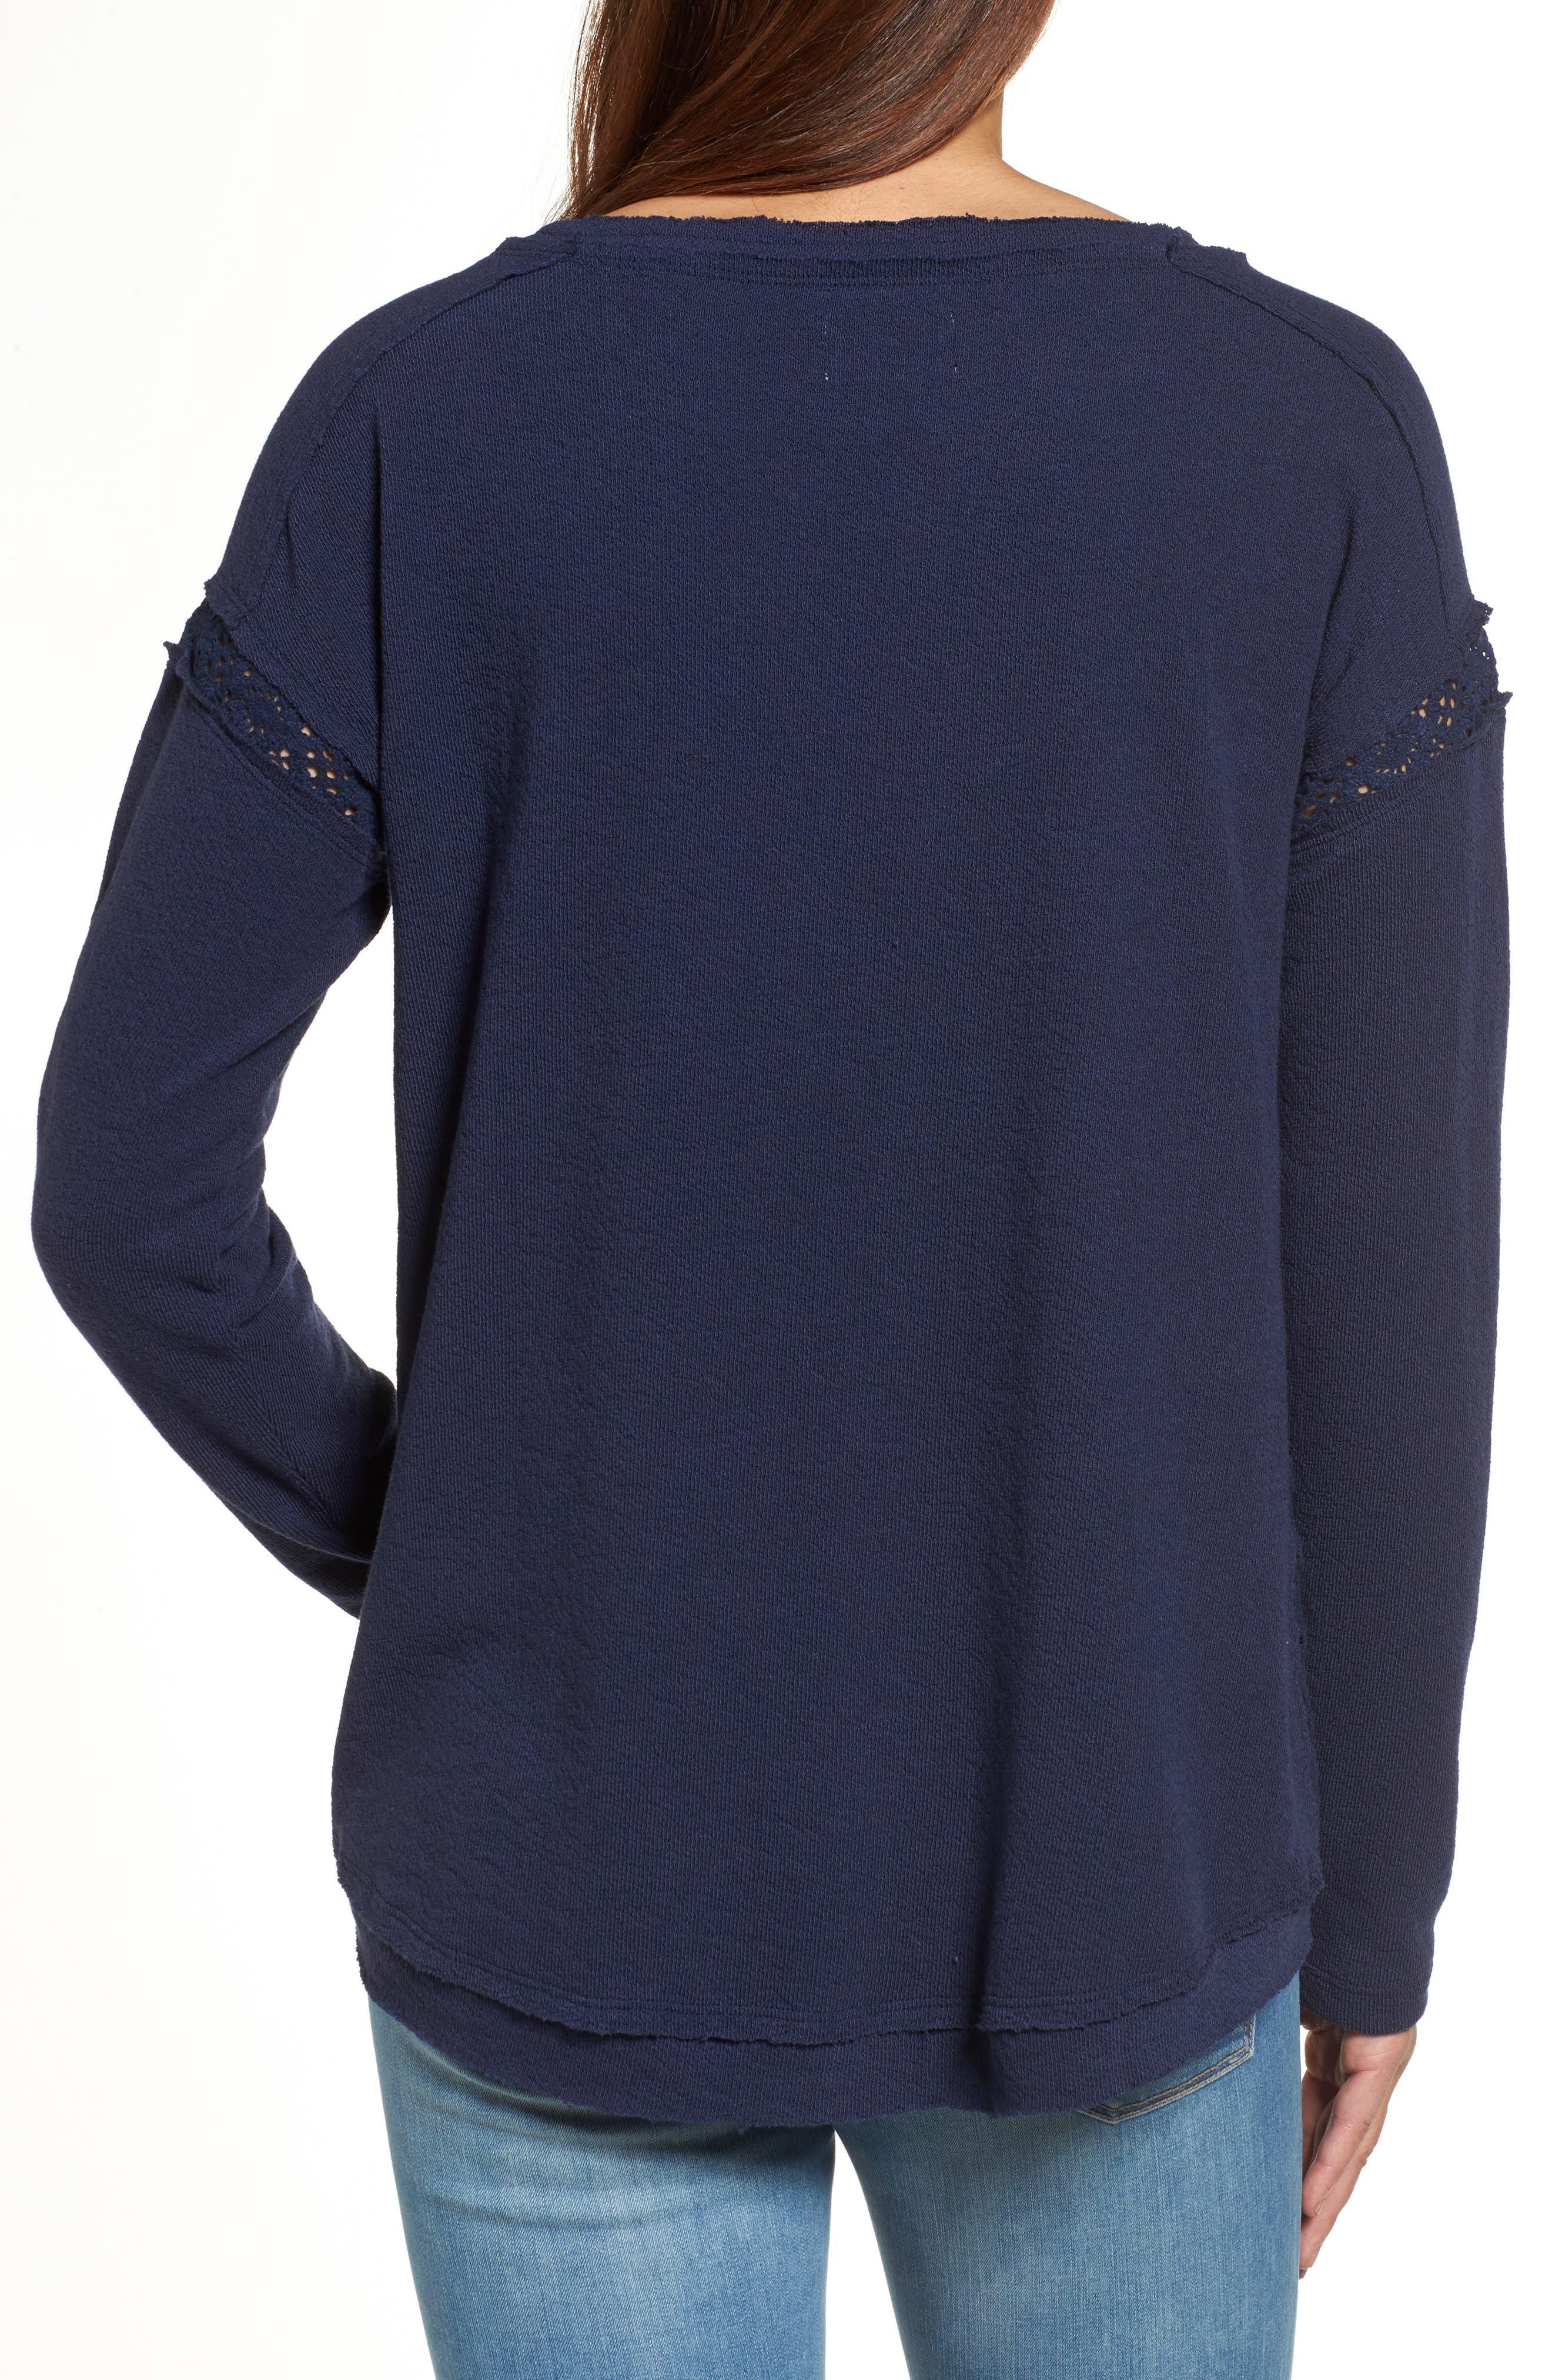 Crochet Lace Trim Sweatshirt,                             Alternate thumbnail 2, color,                             Navy Peacoat